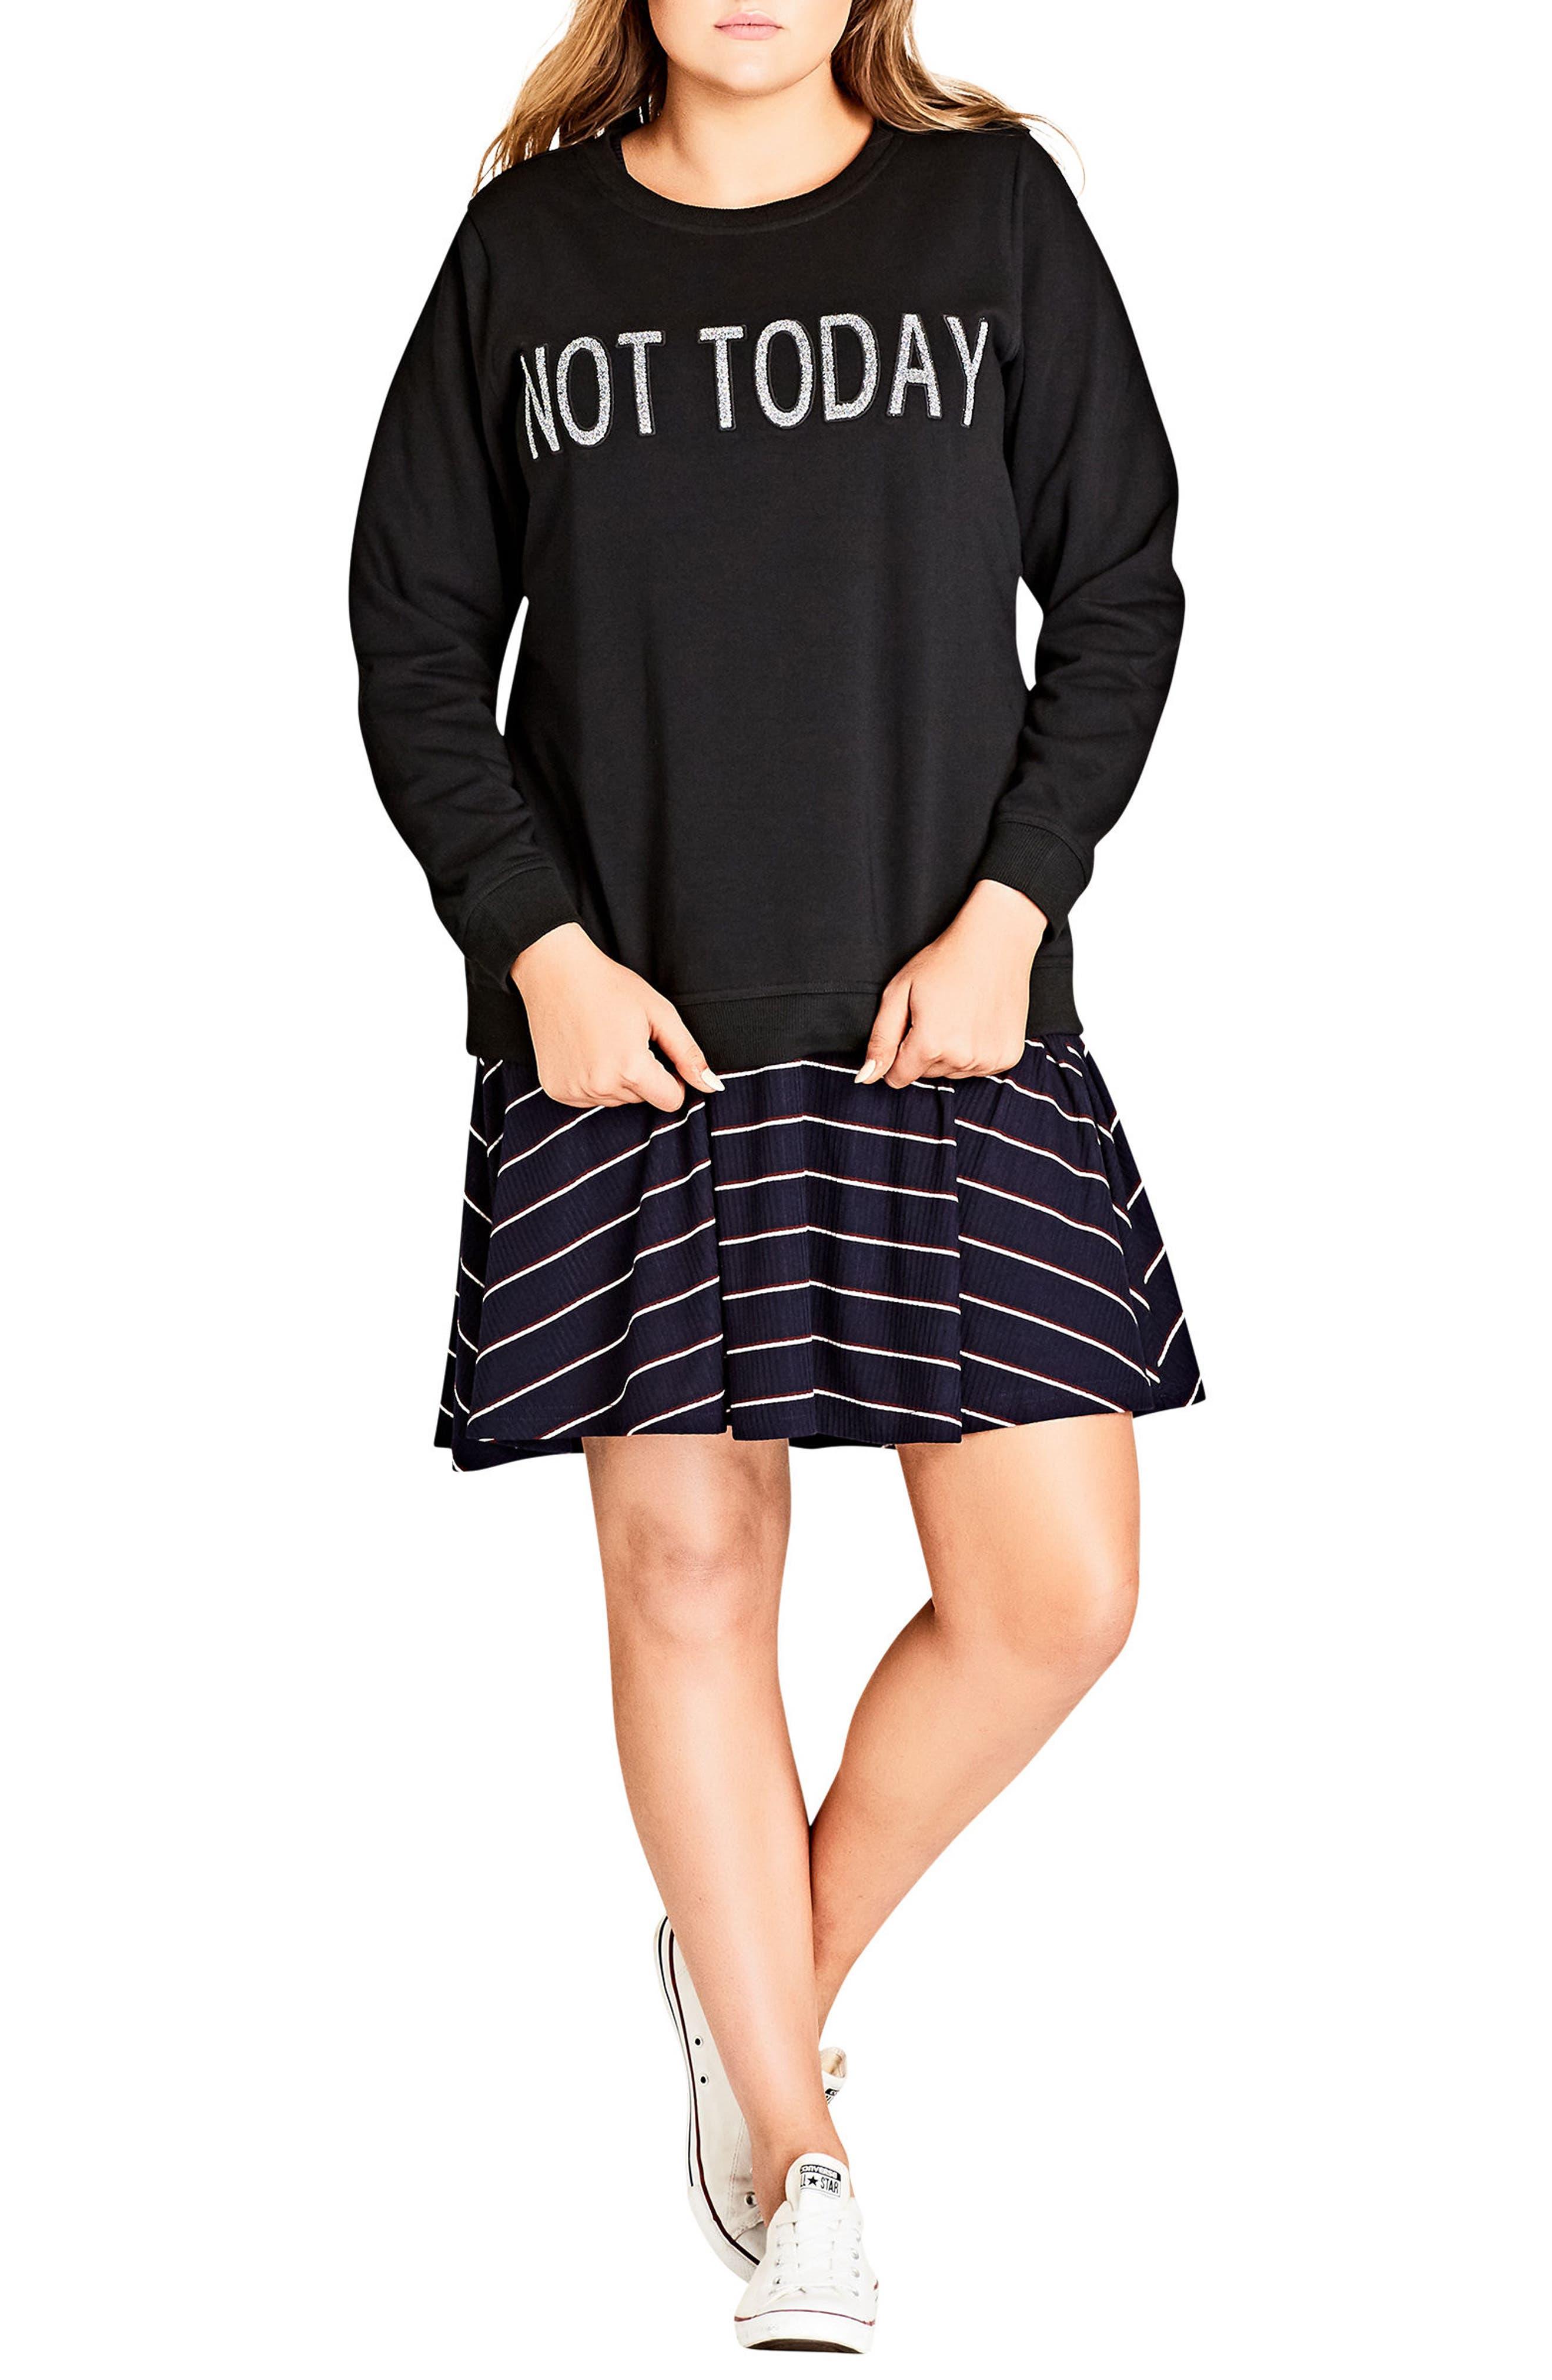 City Chic Top Slogan Sweatshirt (Plus Size)